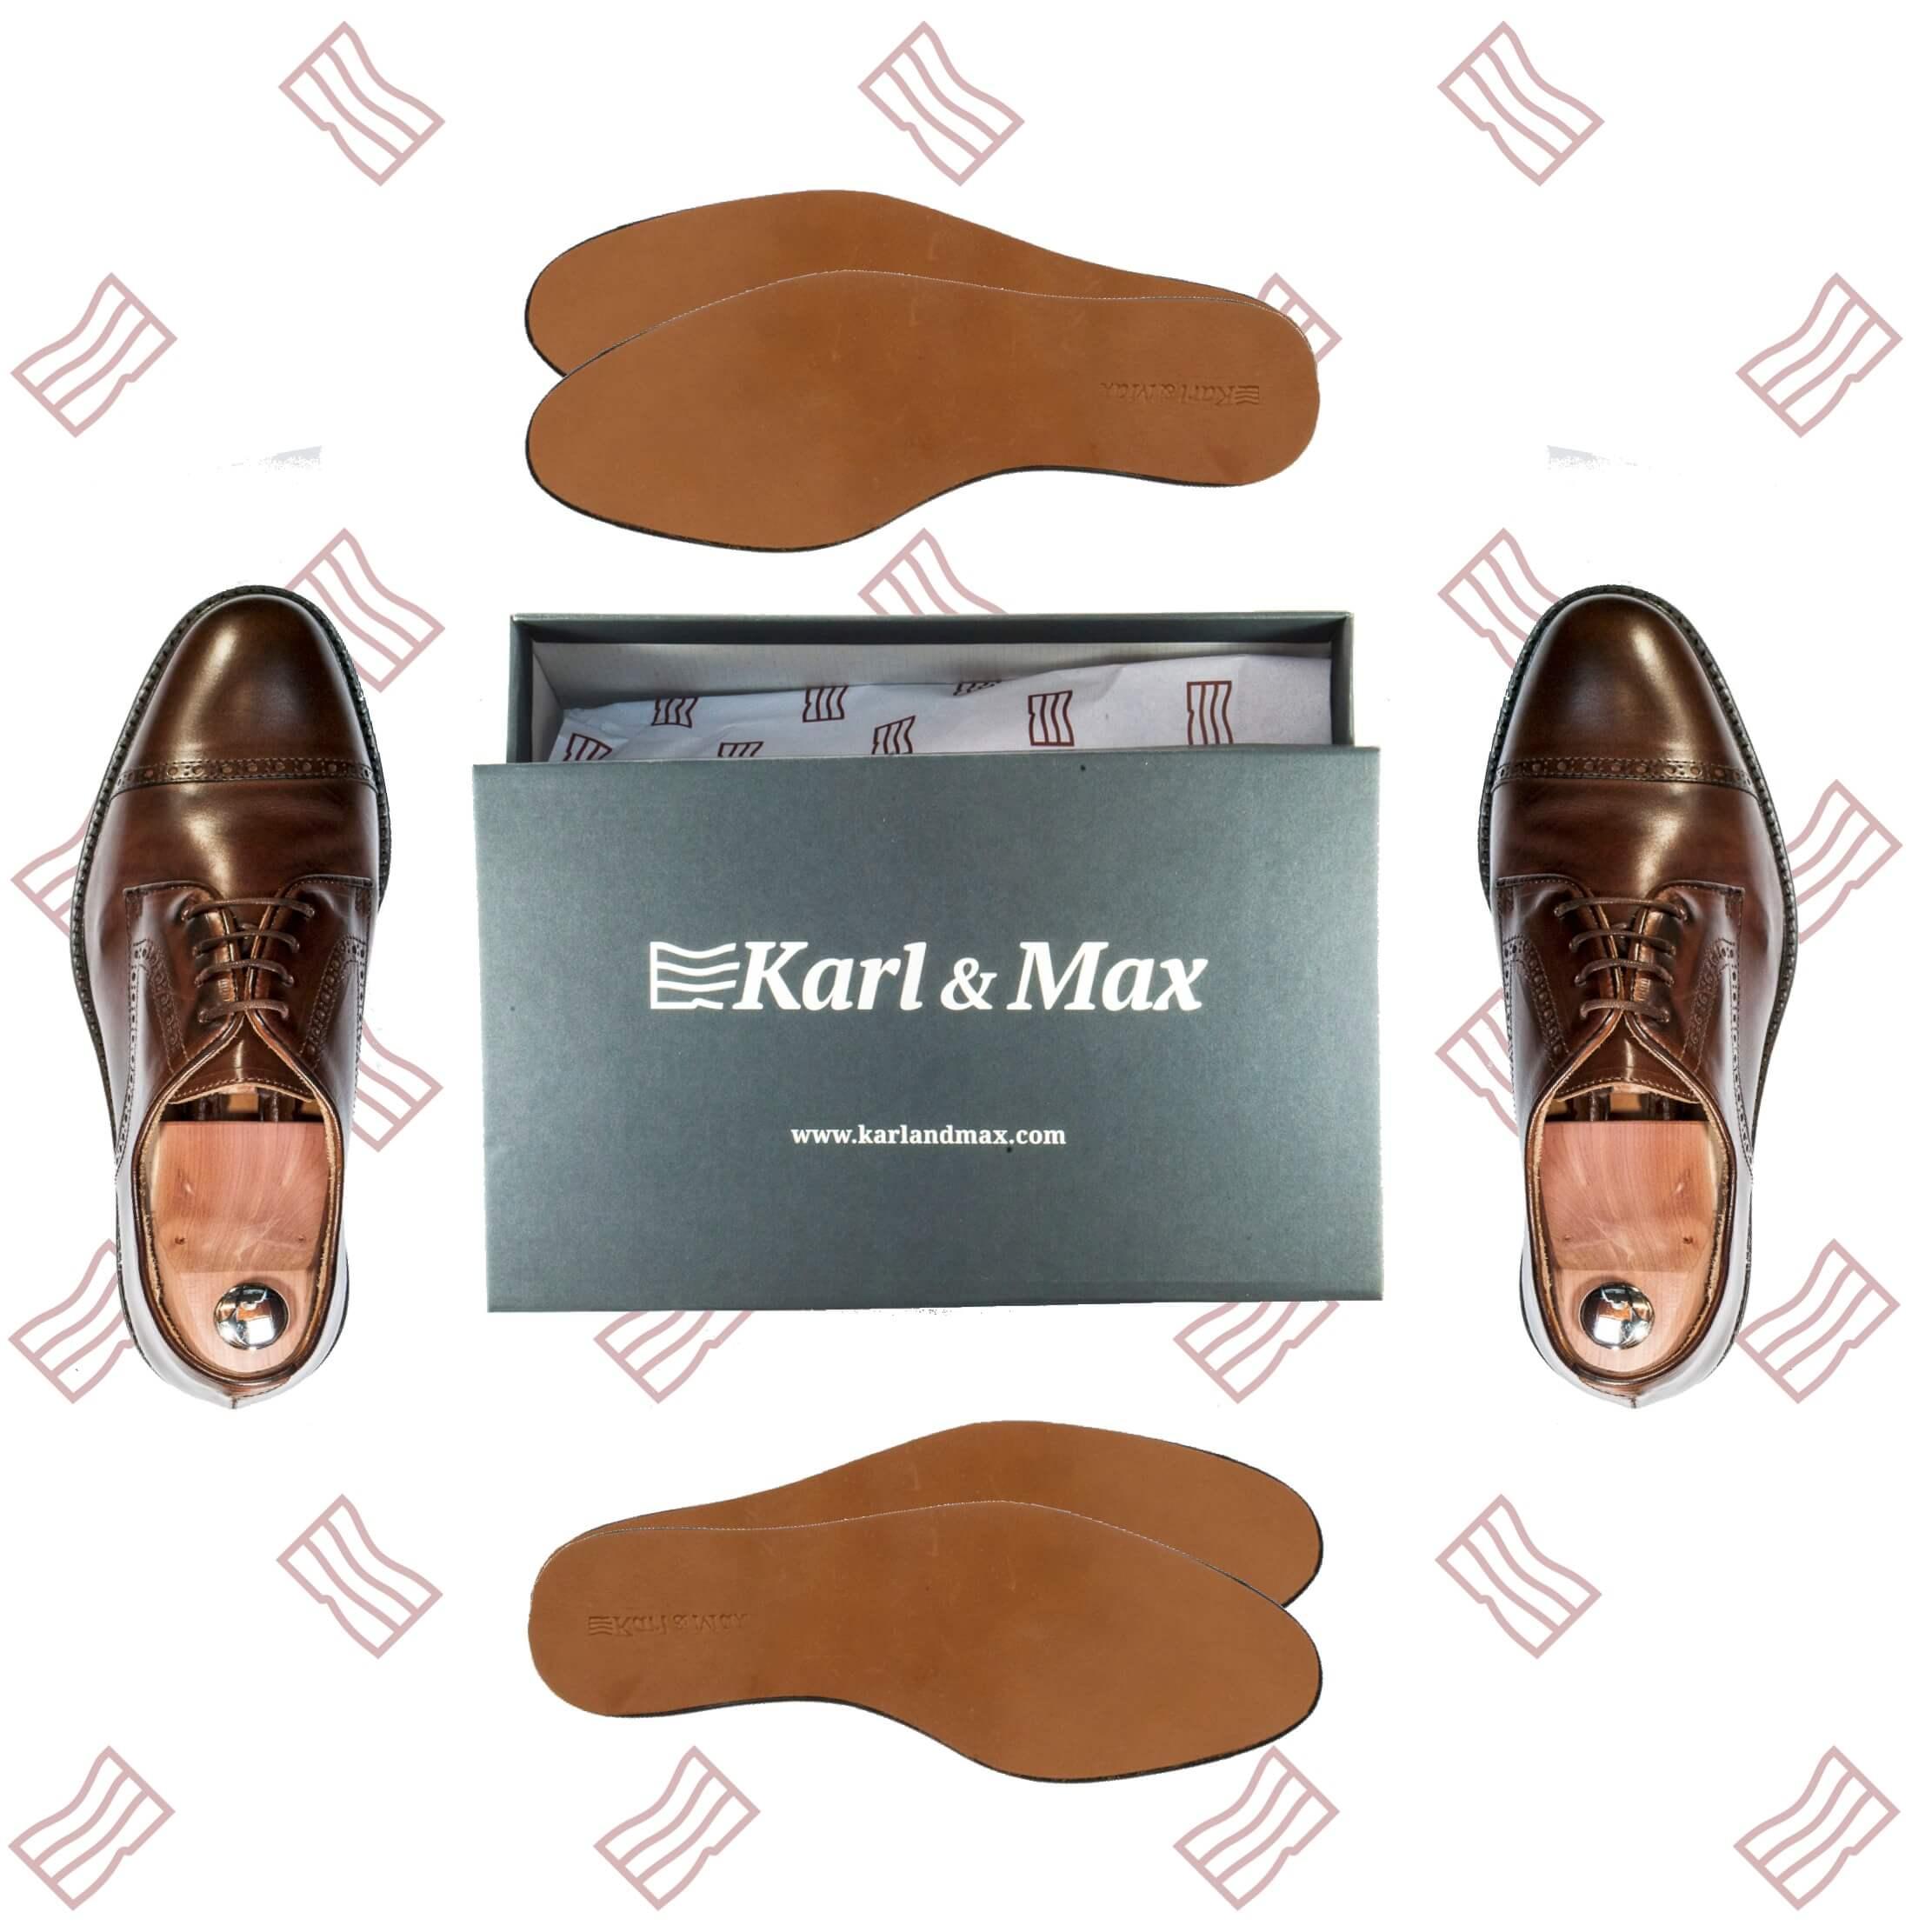 You are currently viewing Les chaussures orthopédiques pour hommes et femmes